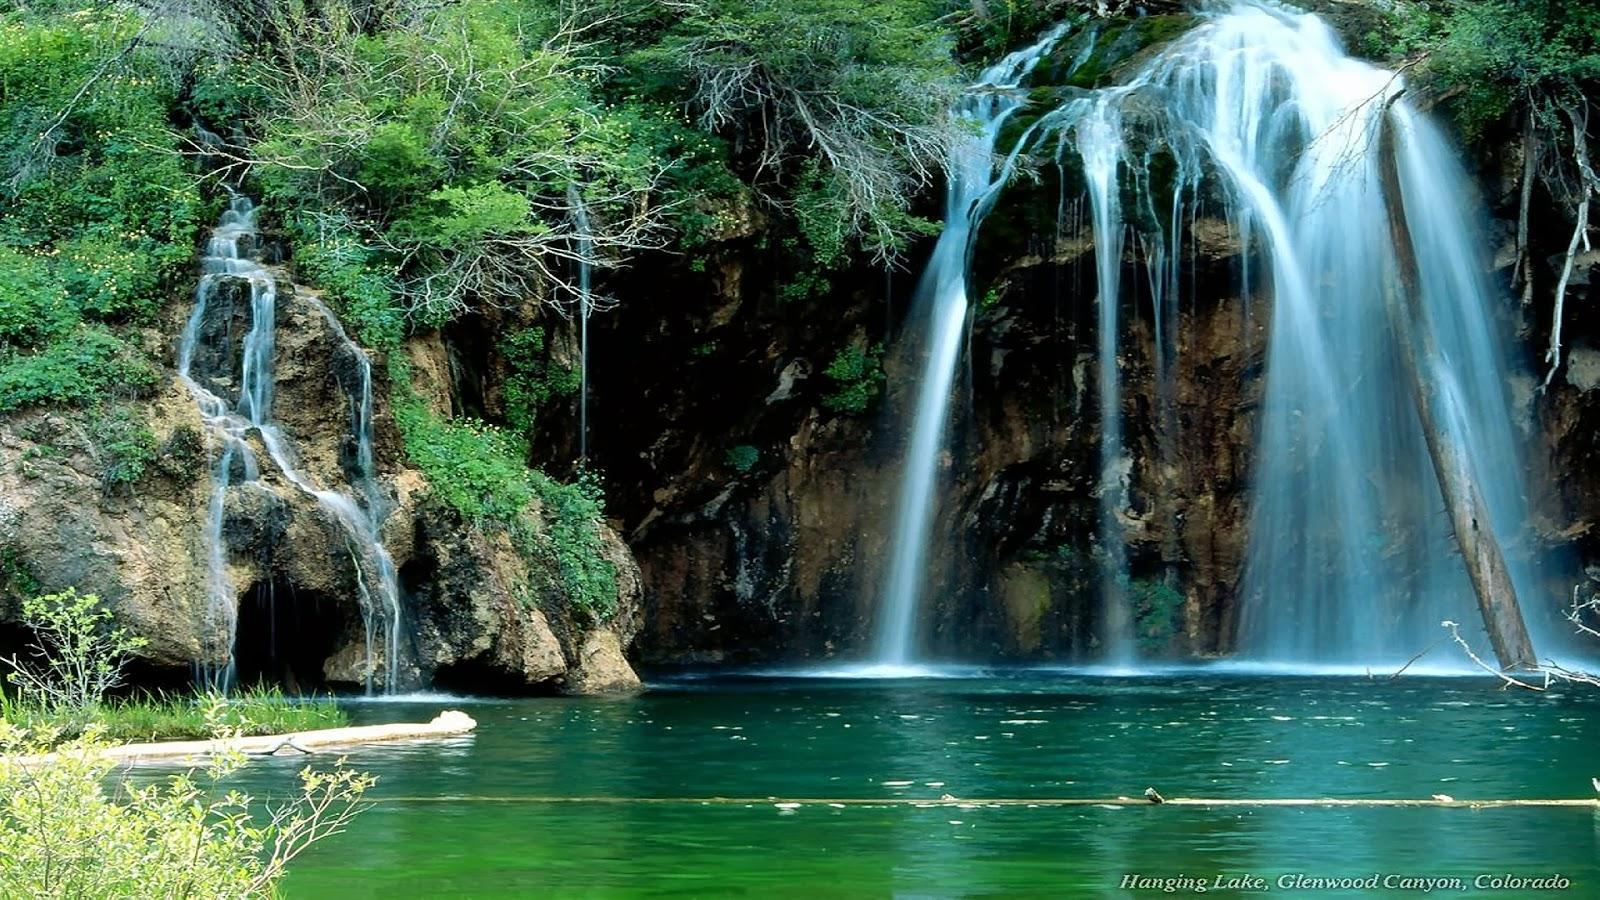 lake colorado nature 1080p wallpapers hd nature 1080p wallpapers 1600x900